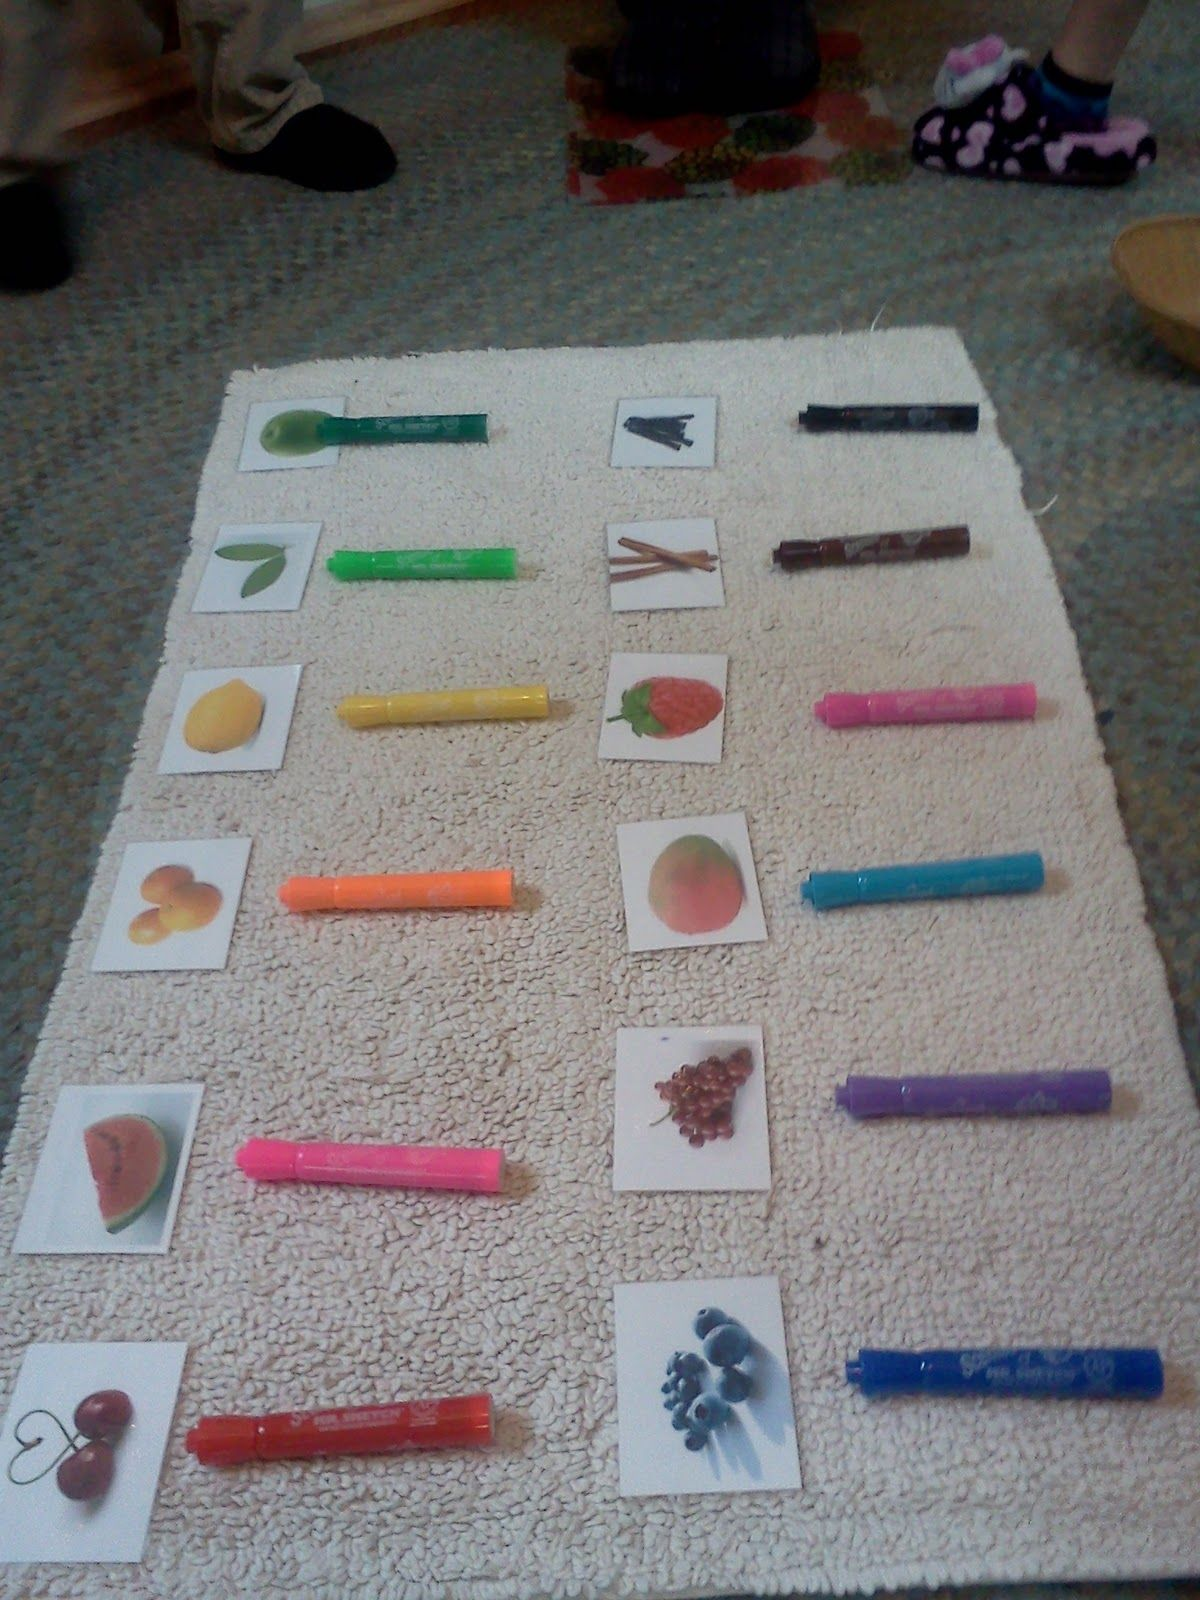 Montessori Design Sense Of Smell Mr Sketch Marker Work